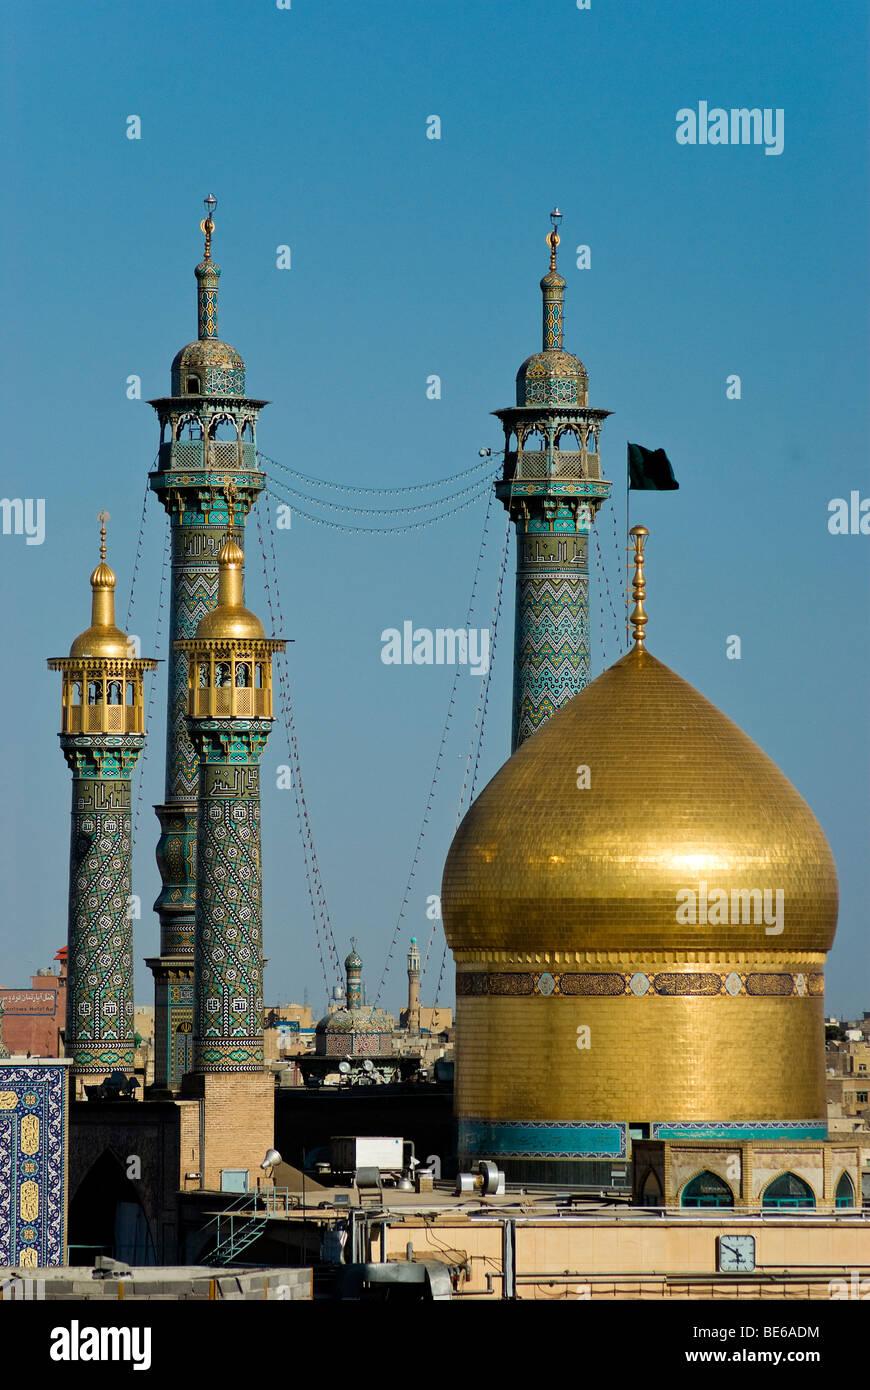 Vista del santuario de Fátima al-Masumeh, Qom, Irán Imagen De Stock